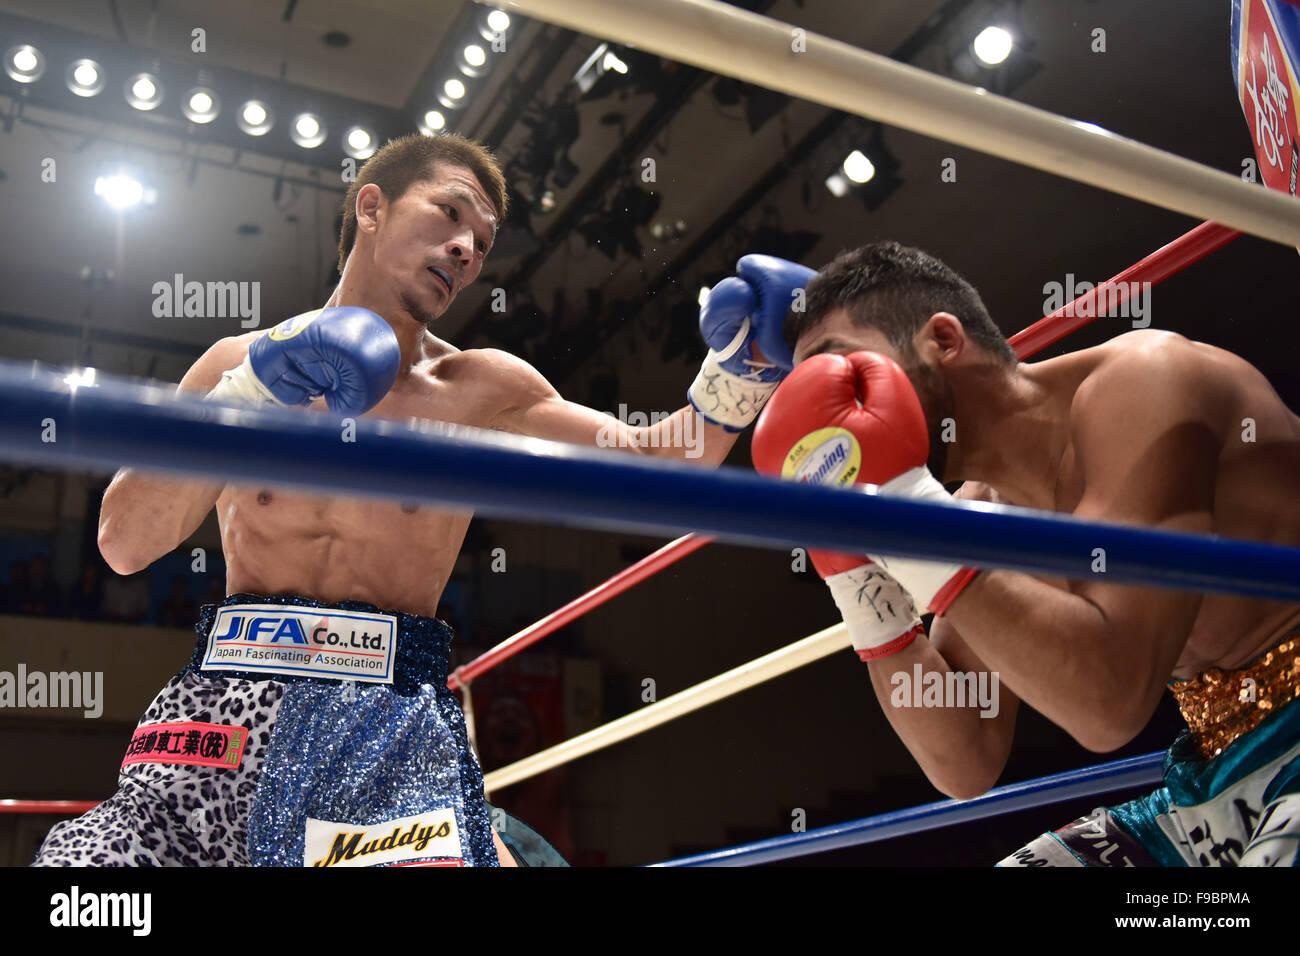 Tokio, Japón. 14 de diciembre de 2015. (L-R) Kenichi Ogawa, Rikki Naito boxeo : Kenichi Ogawa de Japón Imagen De Stock